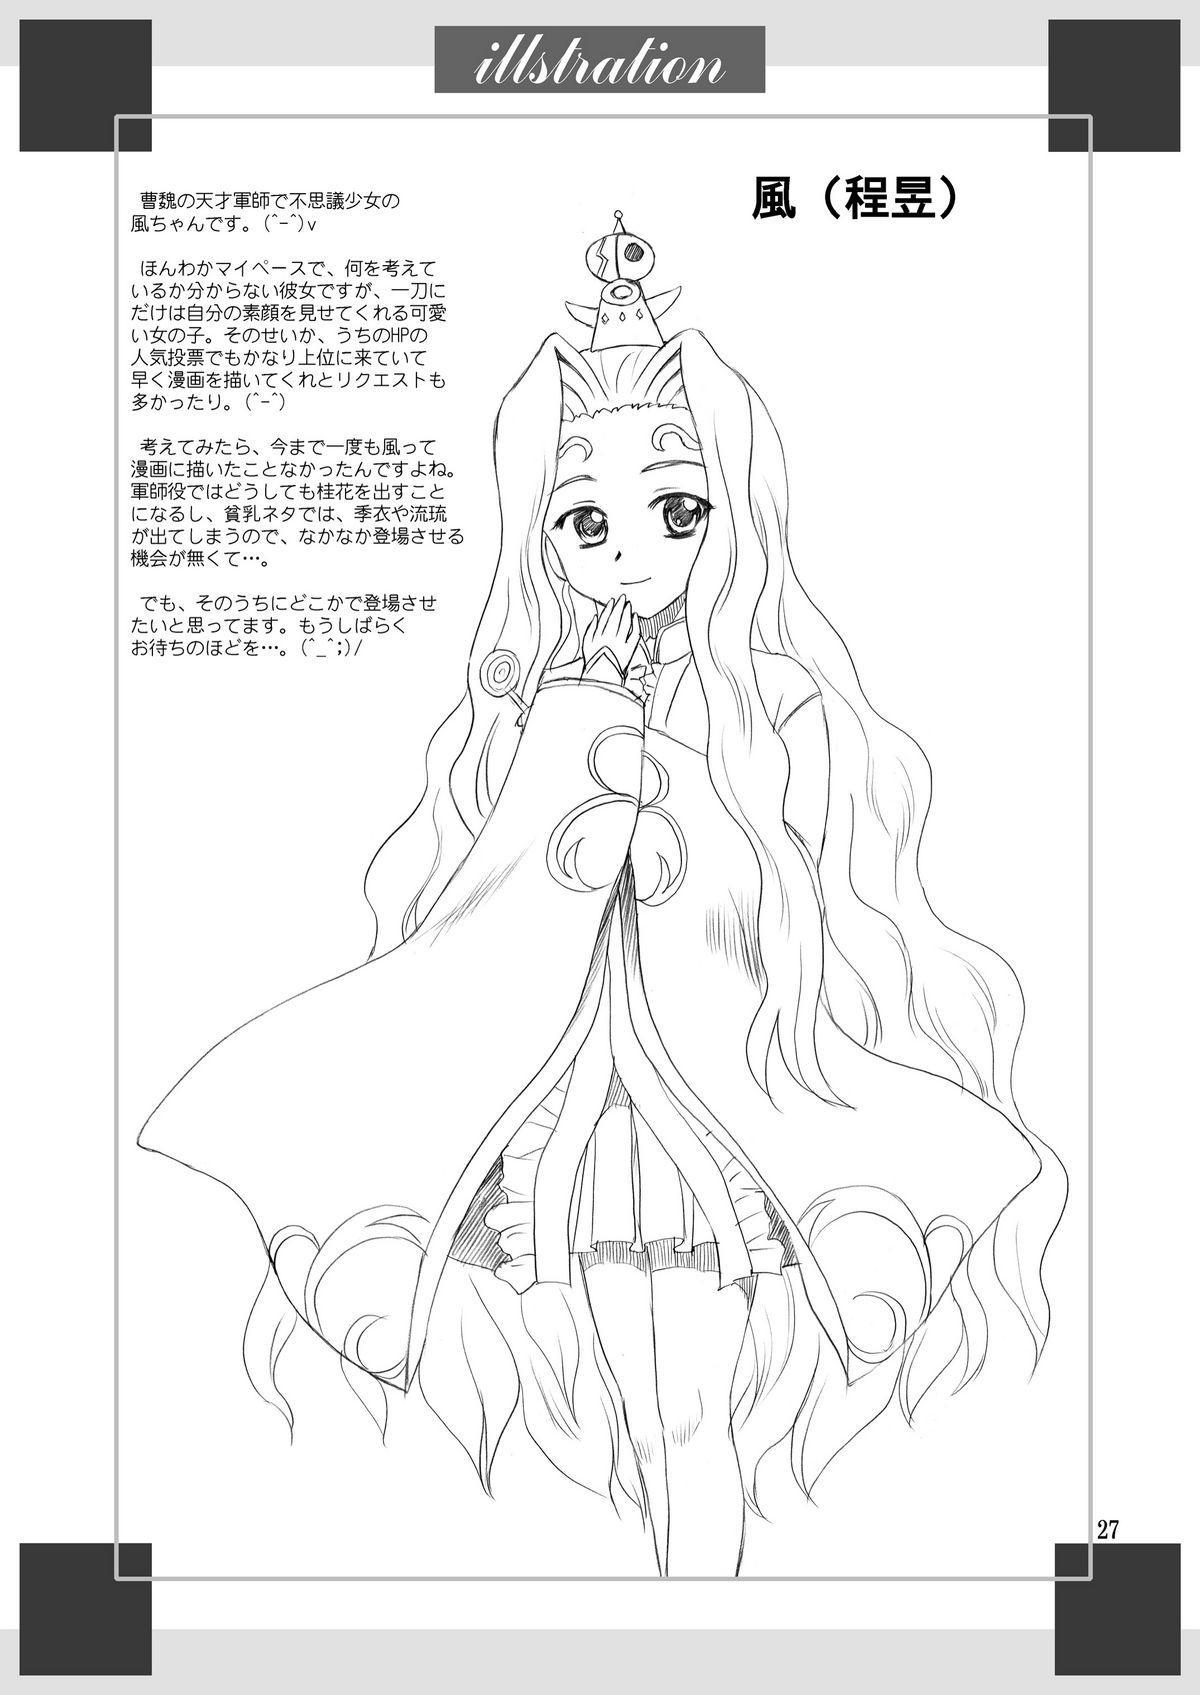 Karin-sama Otsuujiteki Jijou 26